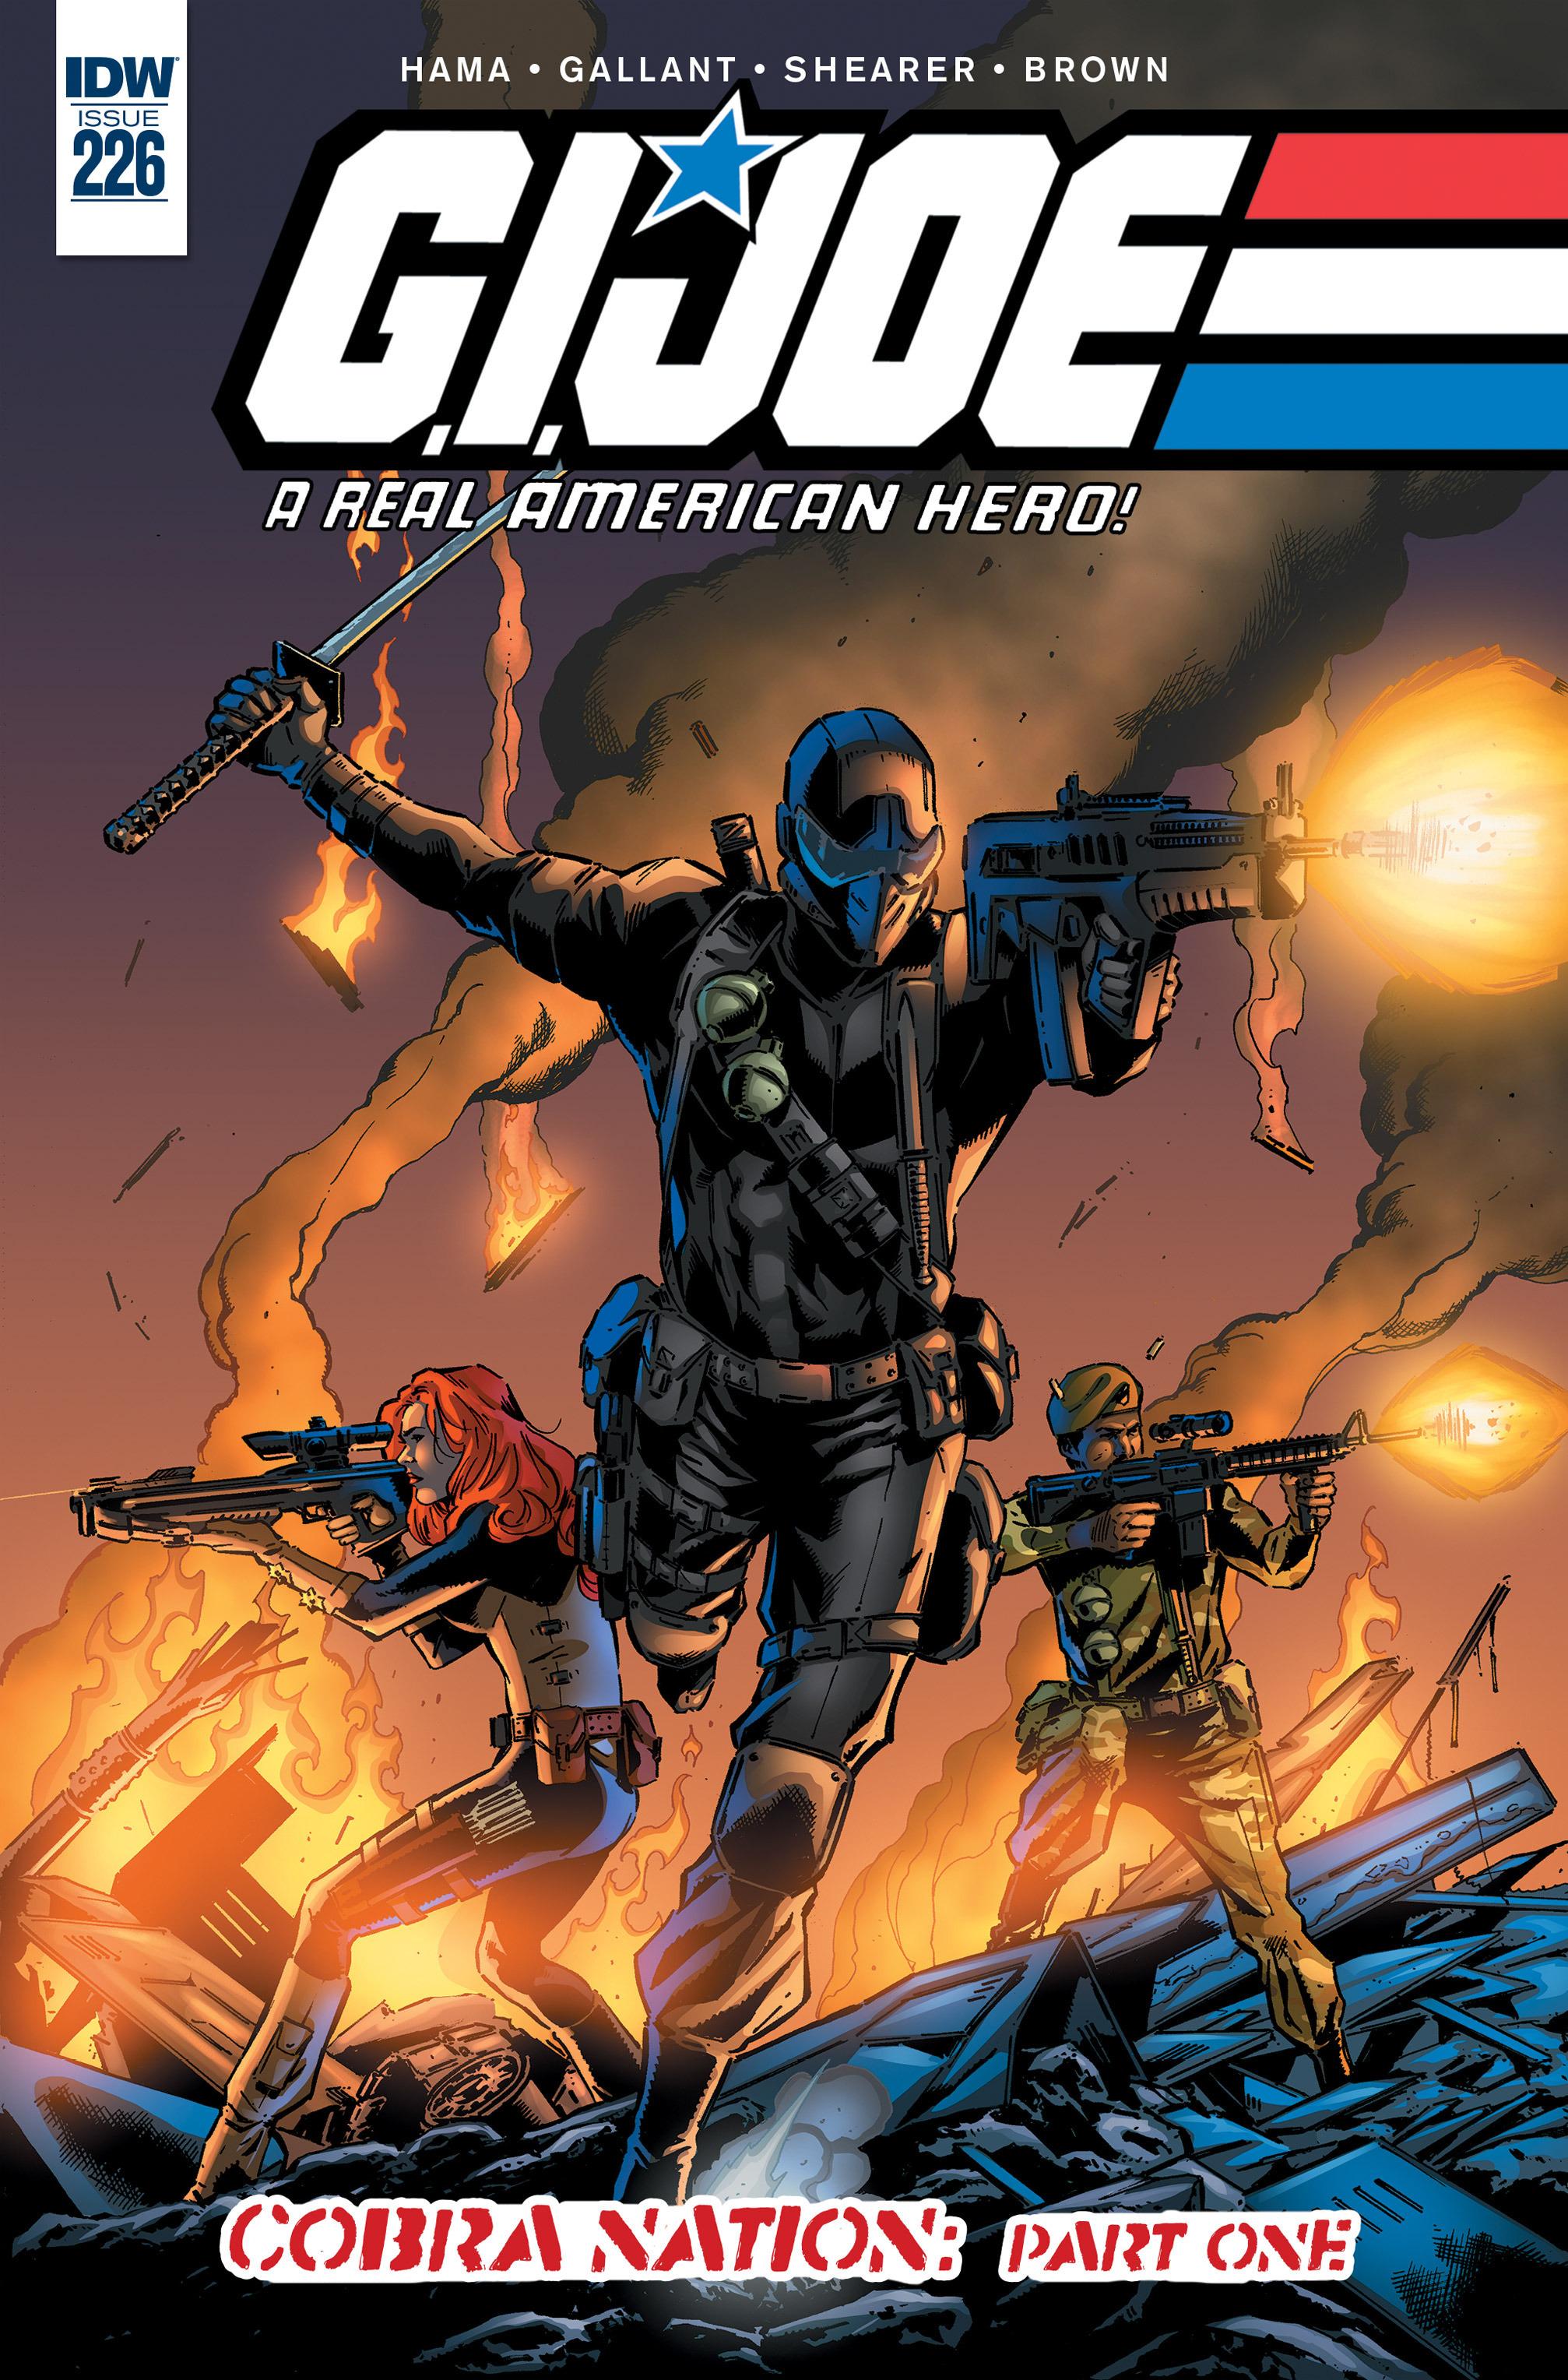 G.I. Joe: A Real American Hero 226 Page 1